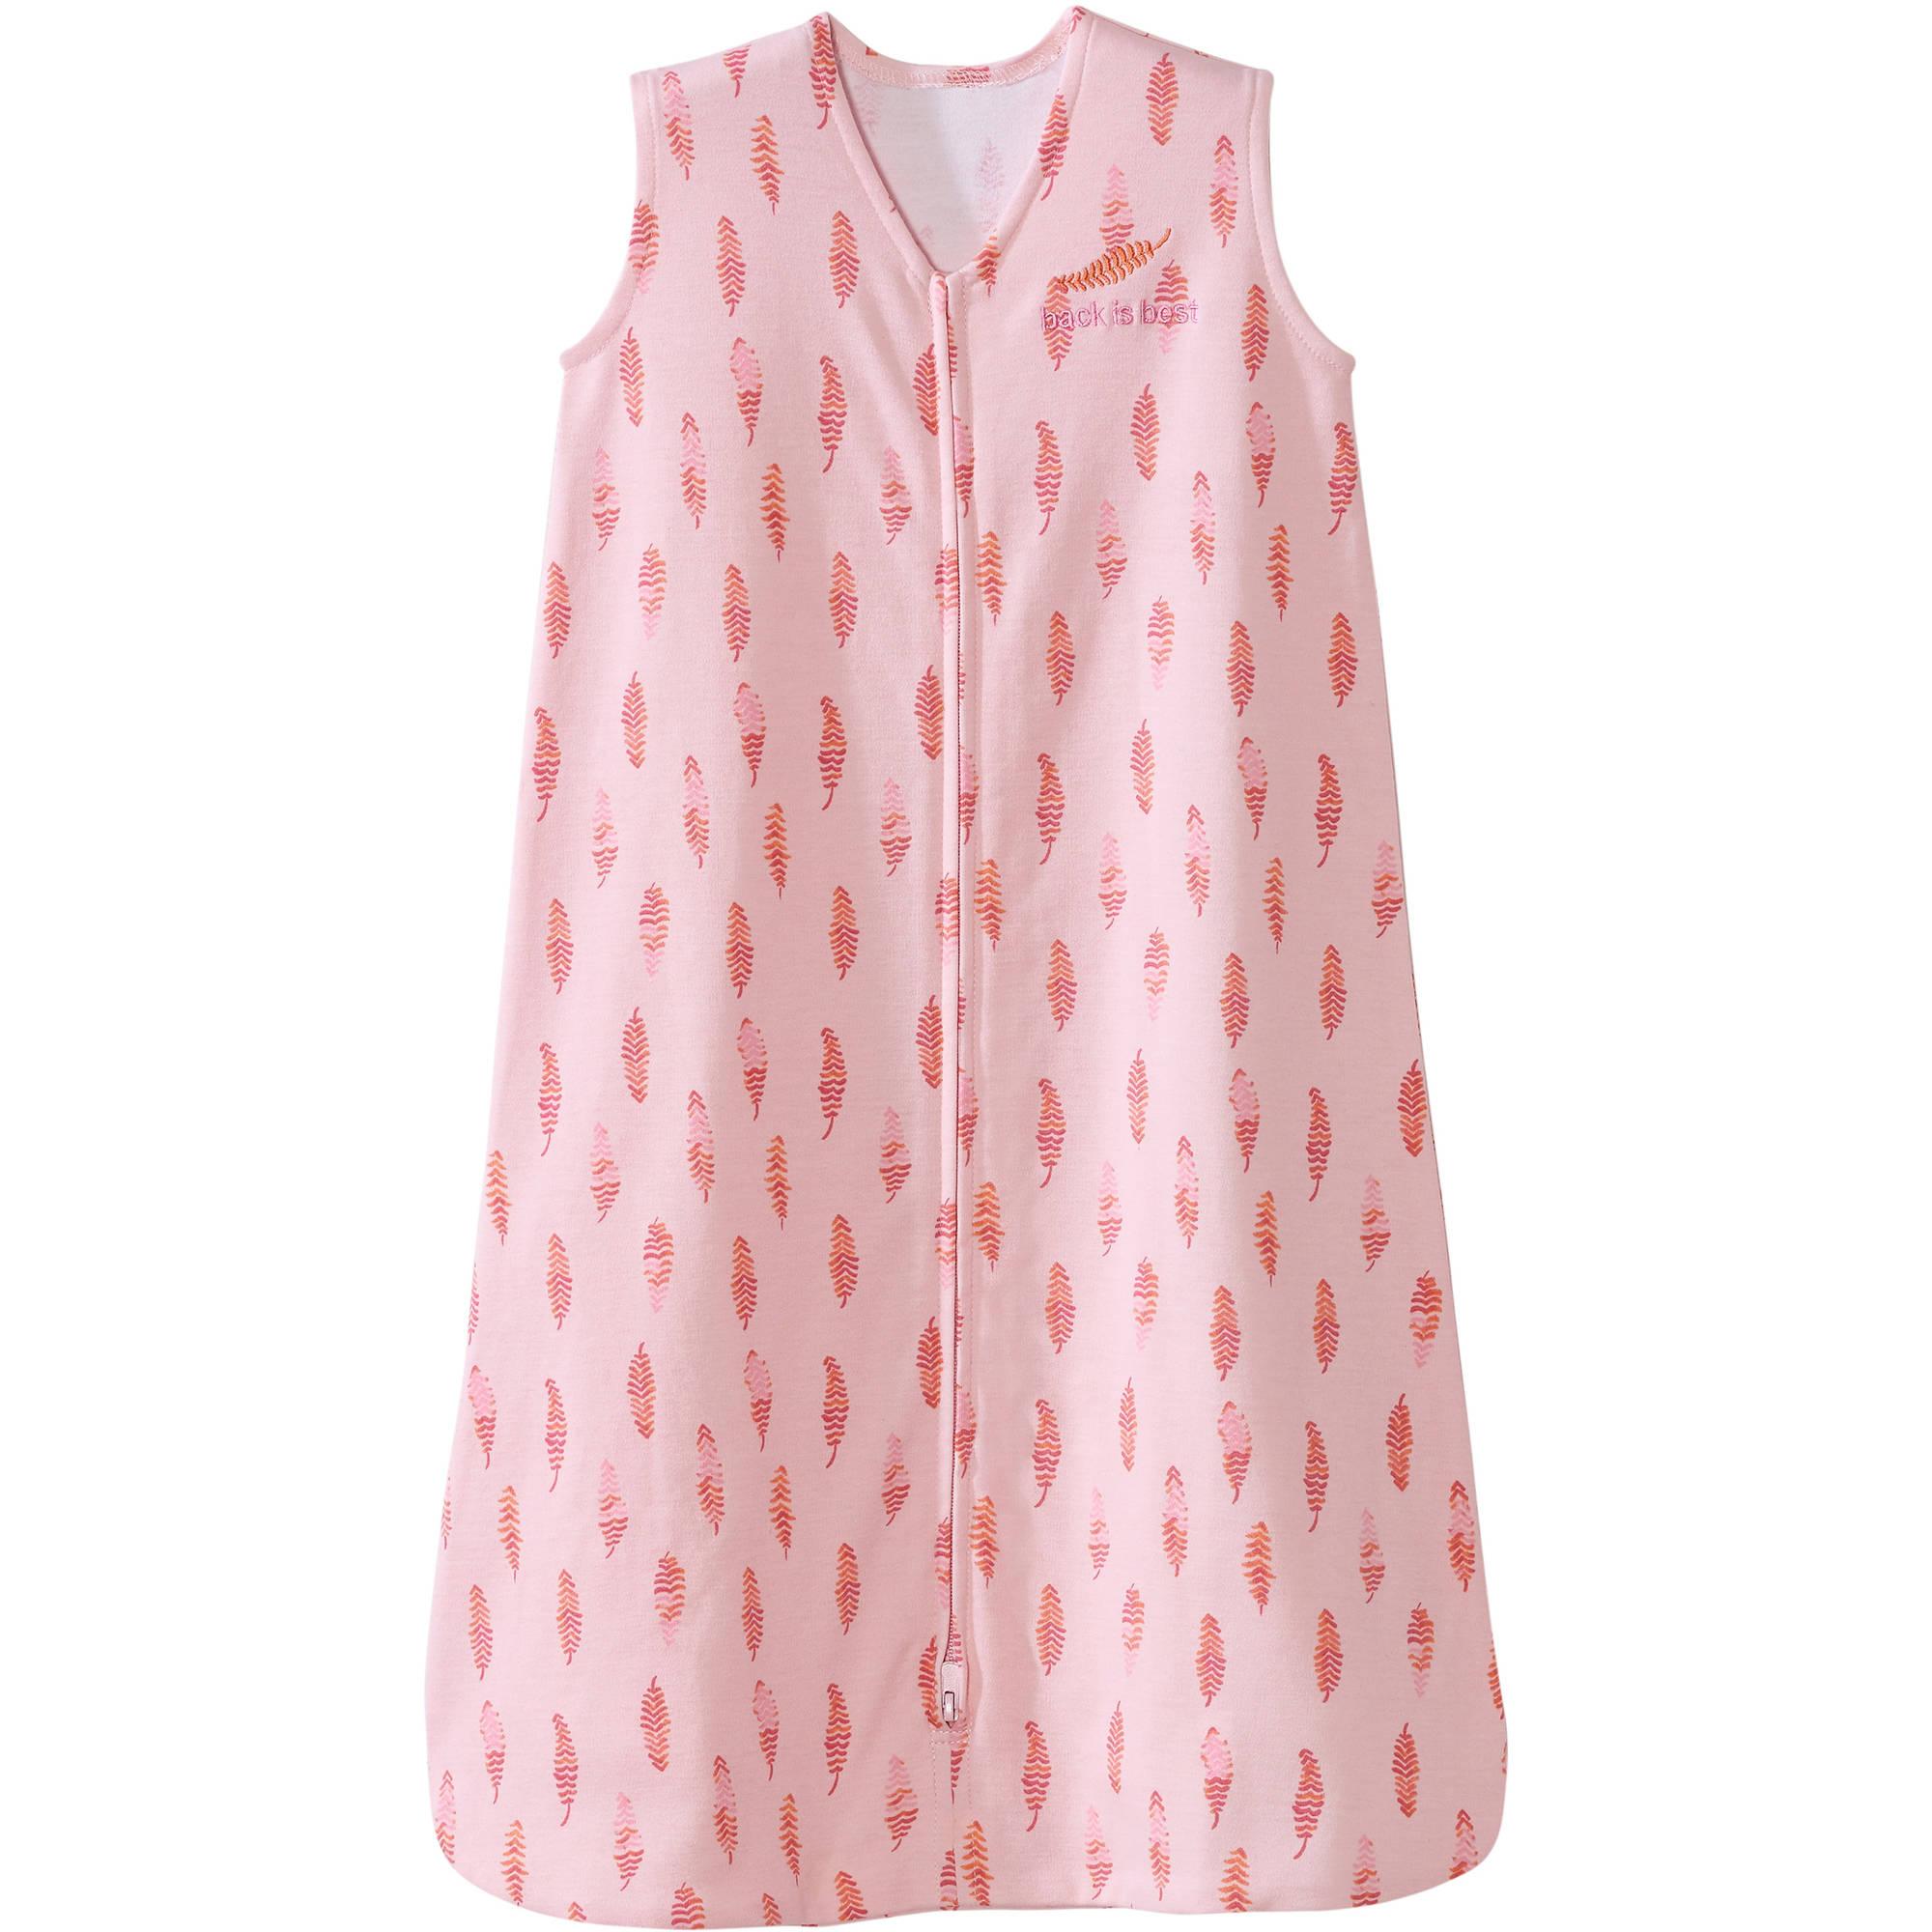 HALO SleepSack Wearable Blanket, 100% Cotton, Cream, Small